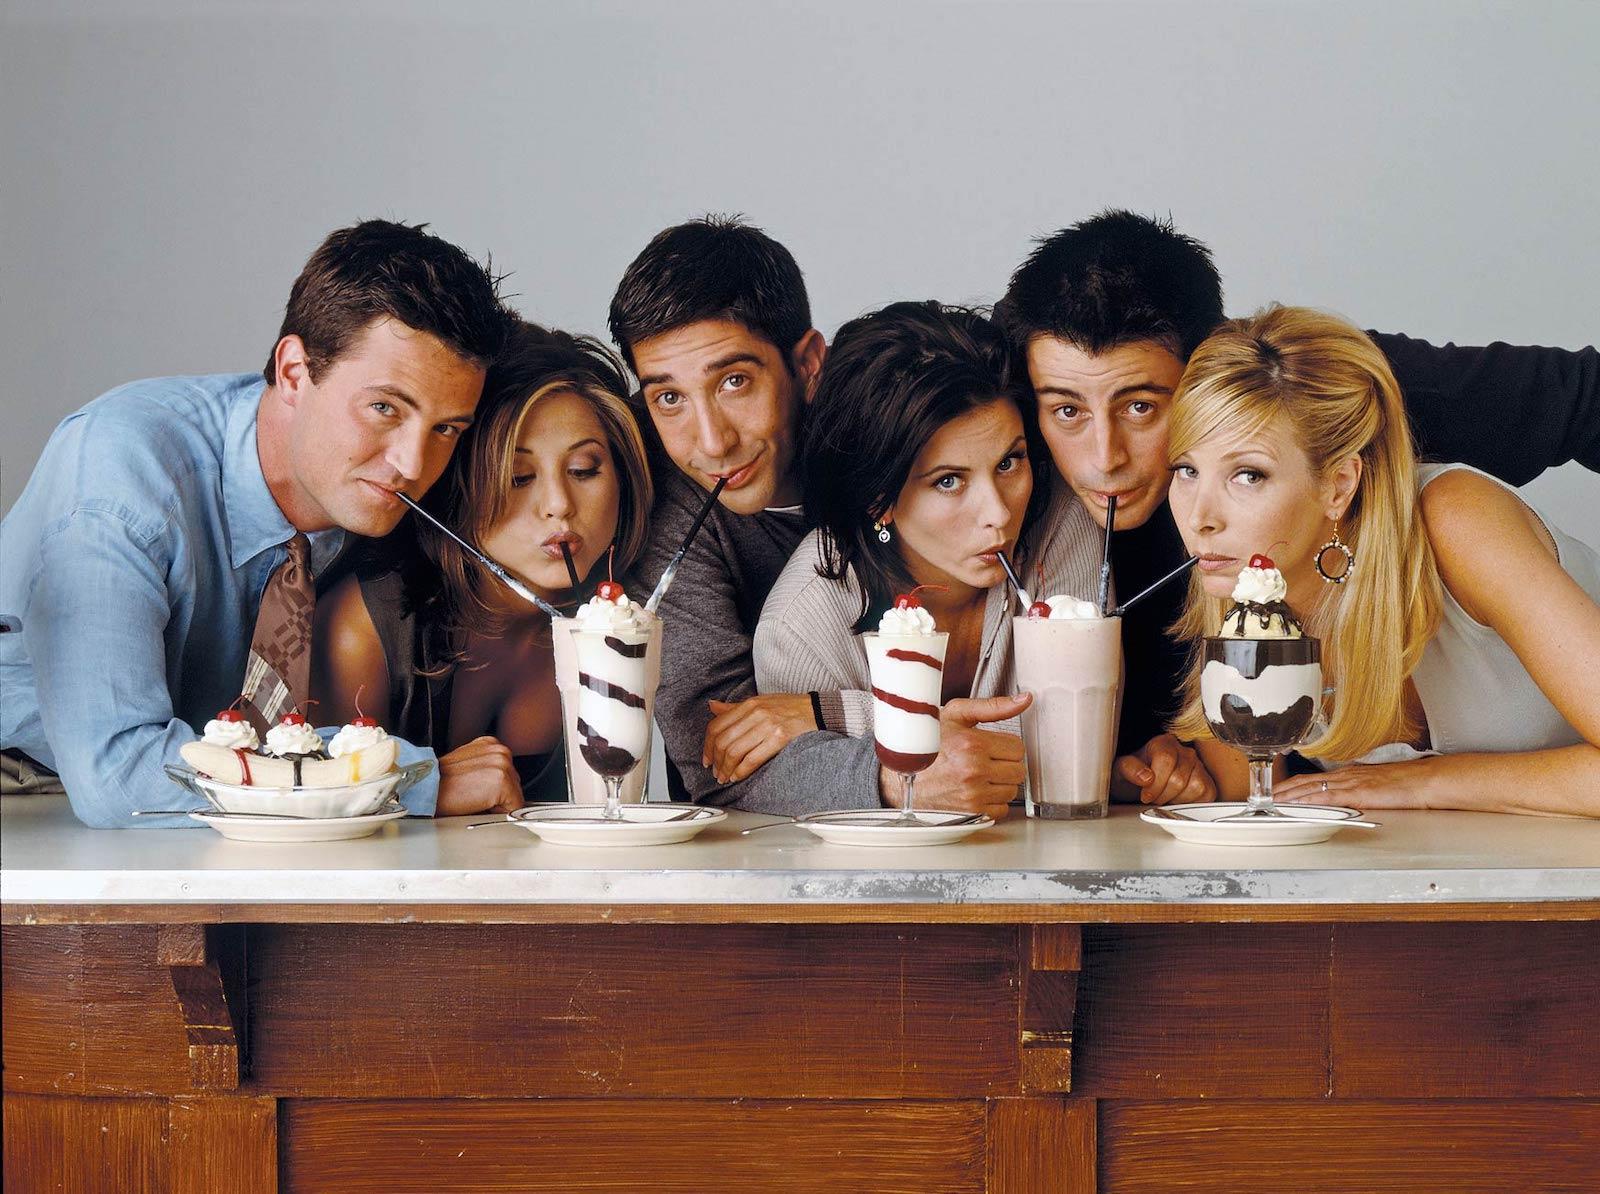 Daftar Serial Televisi Terbaik Yang Wajib Ditonton